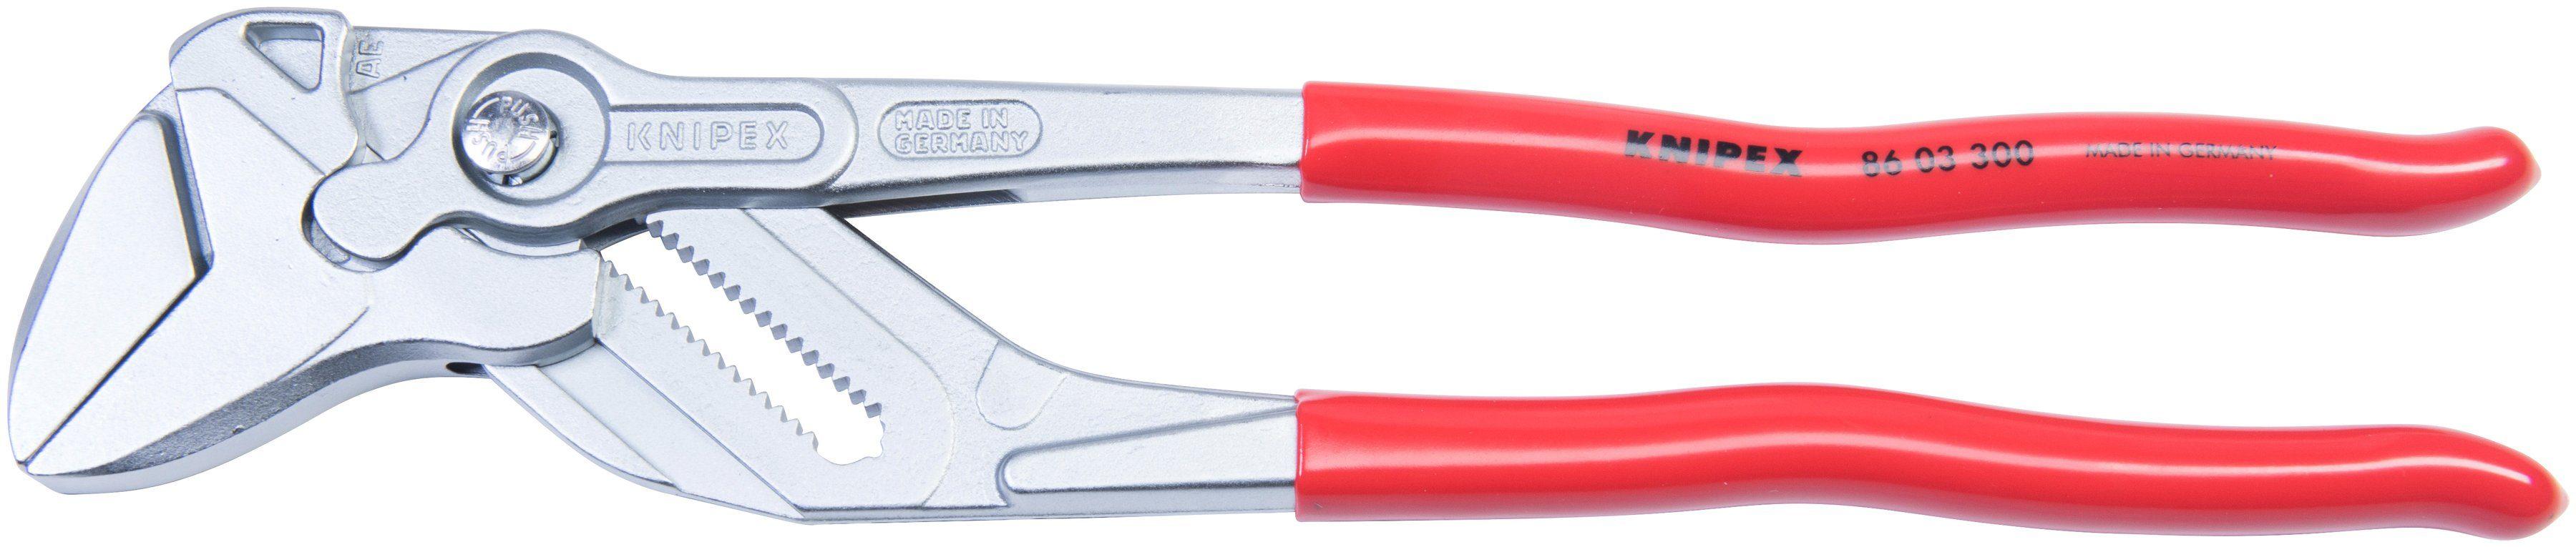 KNIPEX Zangenschlüssel , 300 mm